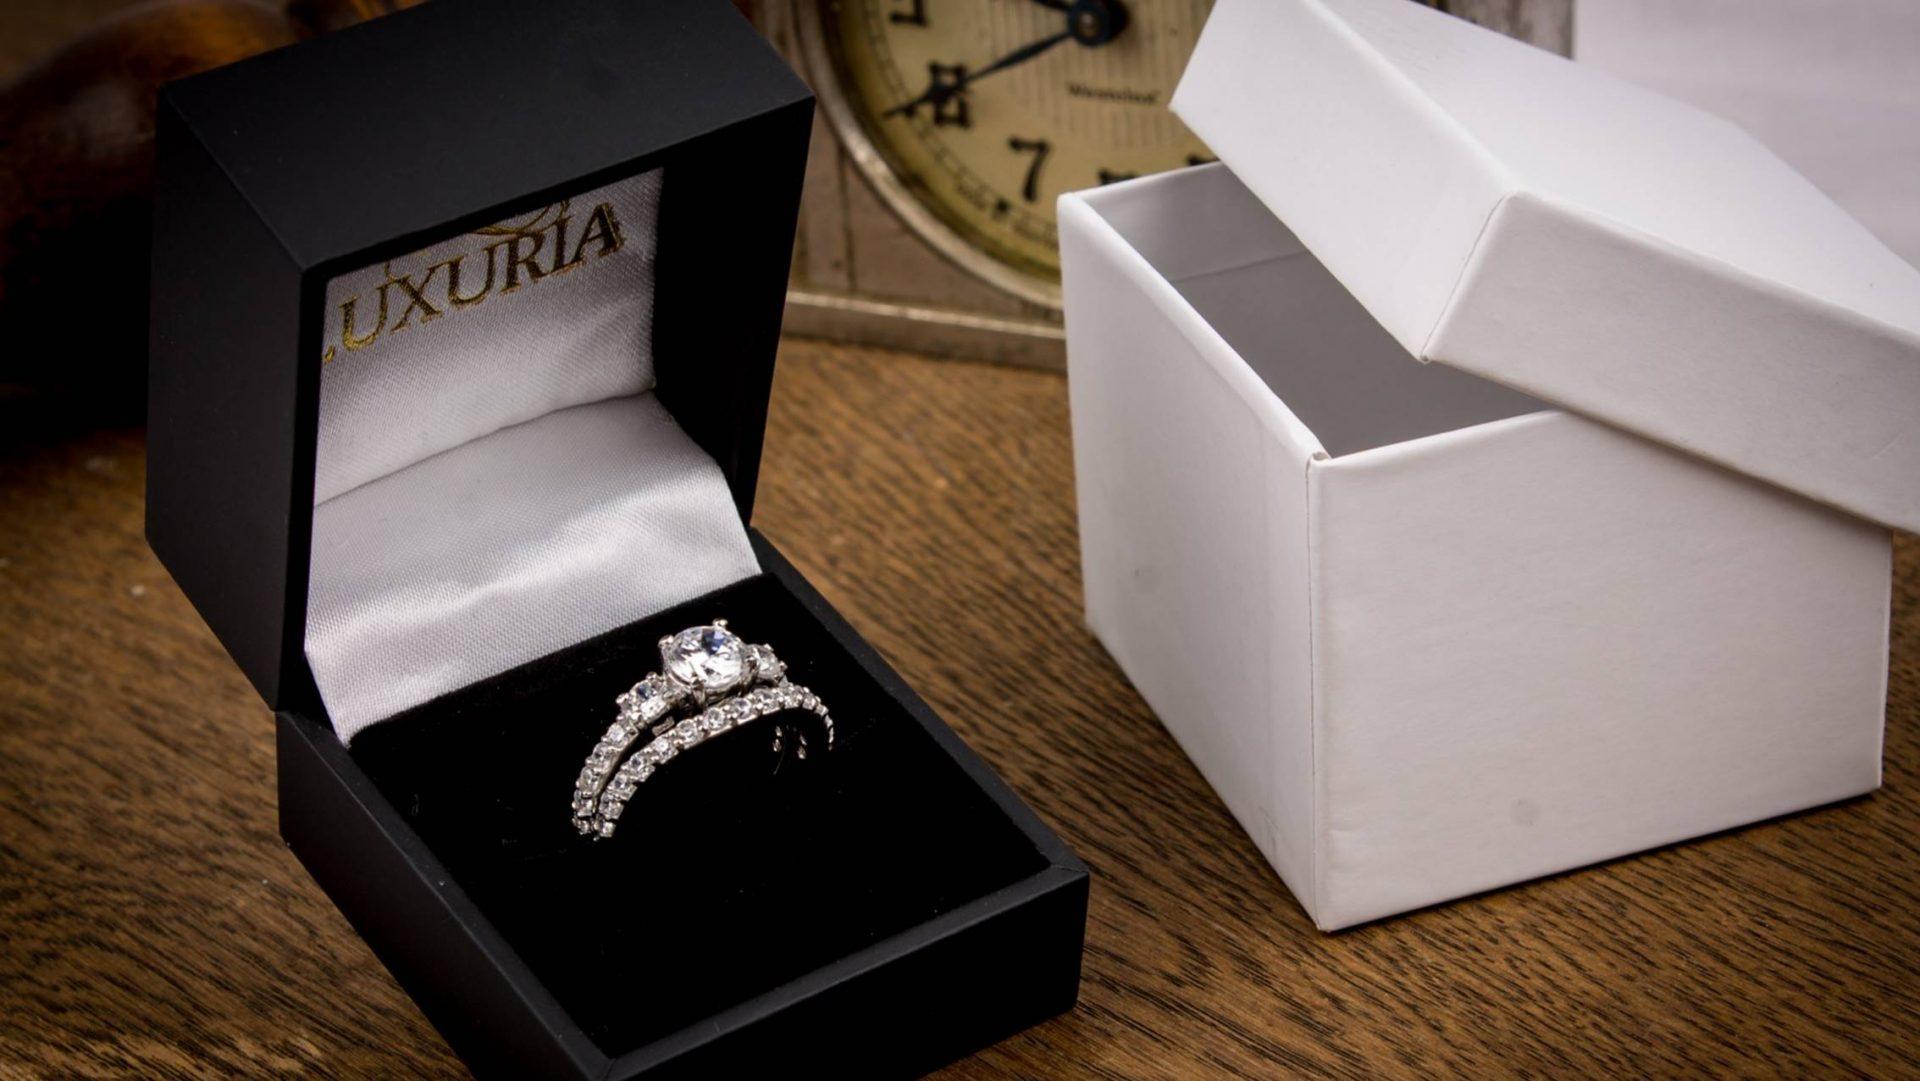 Luxuria Jewellery Brand - PROMEISA dual band diamond simulant engagement ring